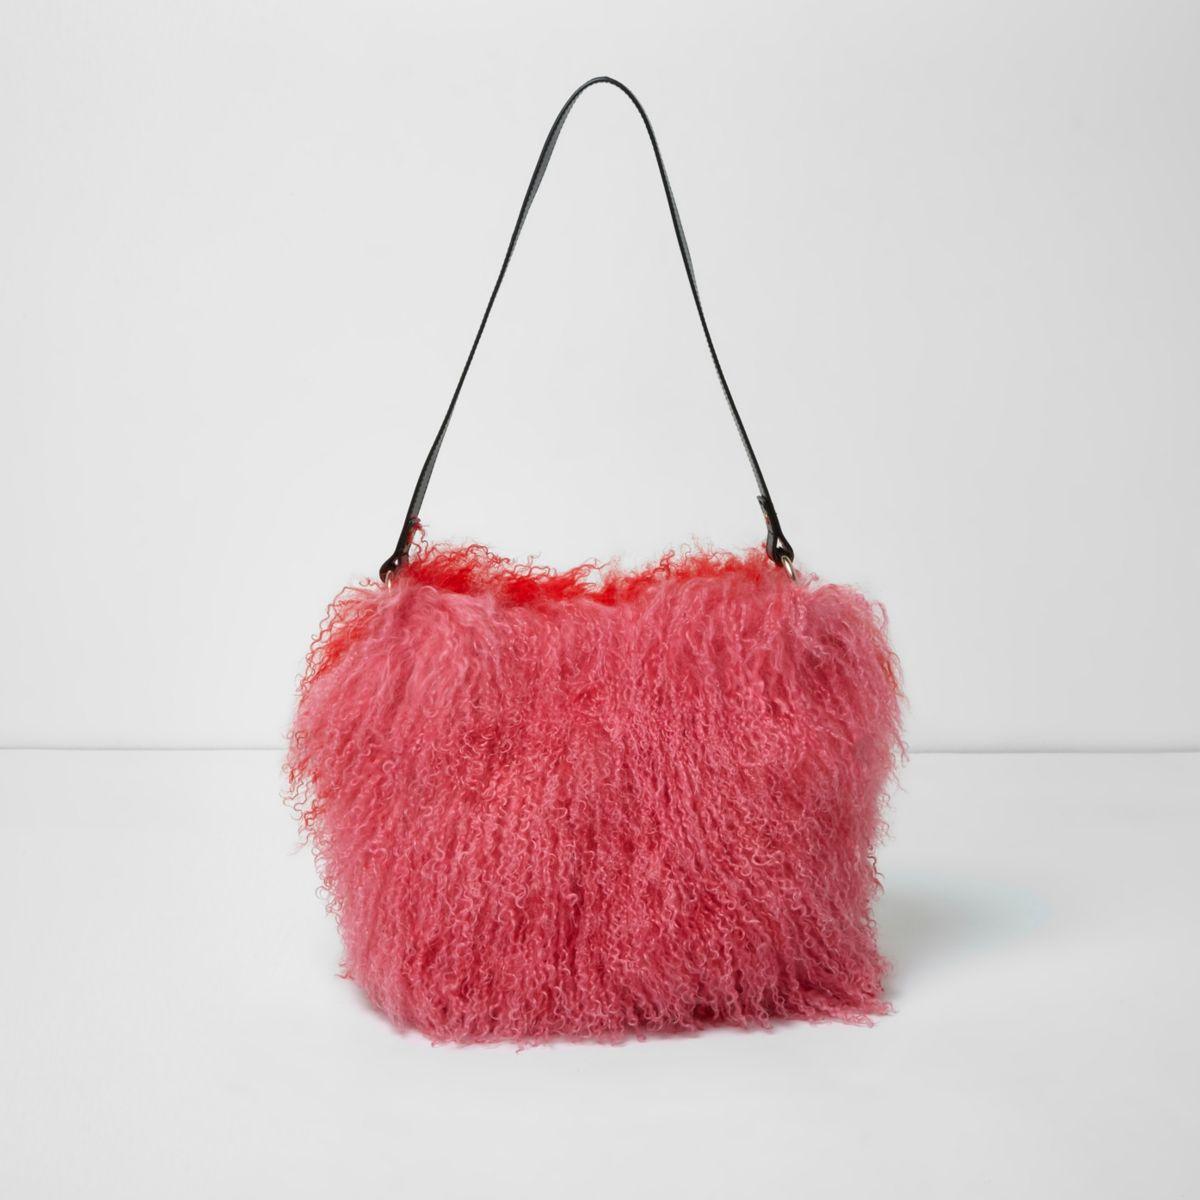 Pink red mongolian wool leather bucket bag